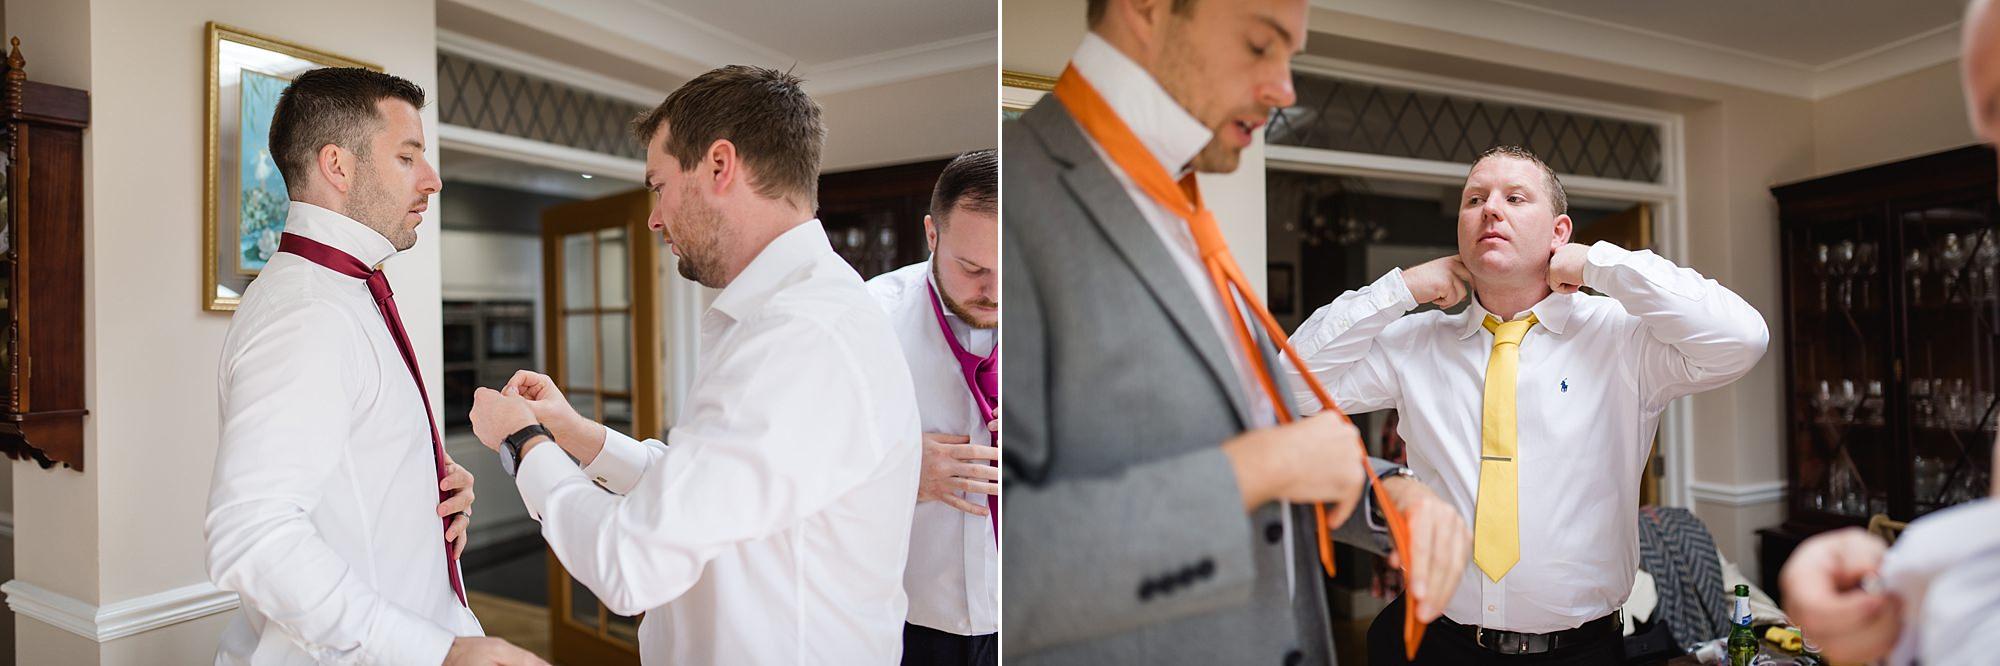 Fun London Wedding portrait of groomsmen tying ties